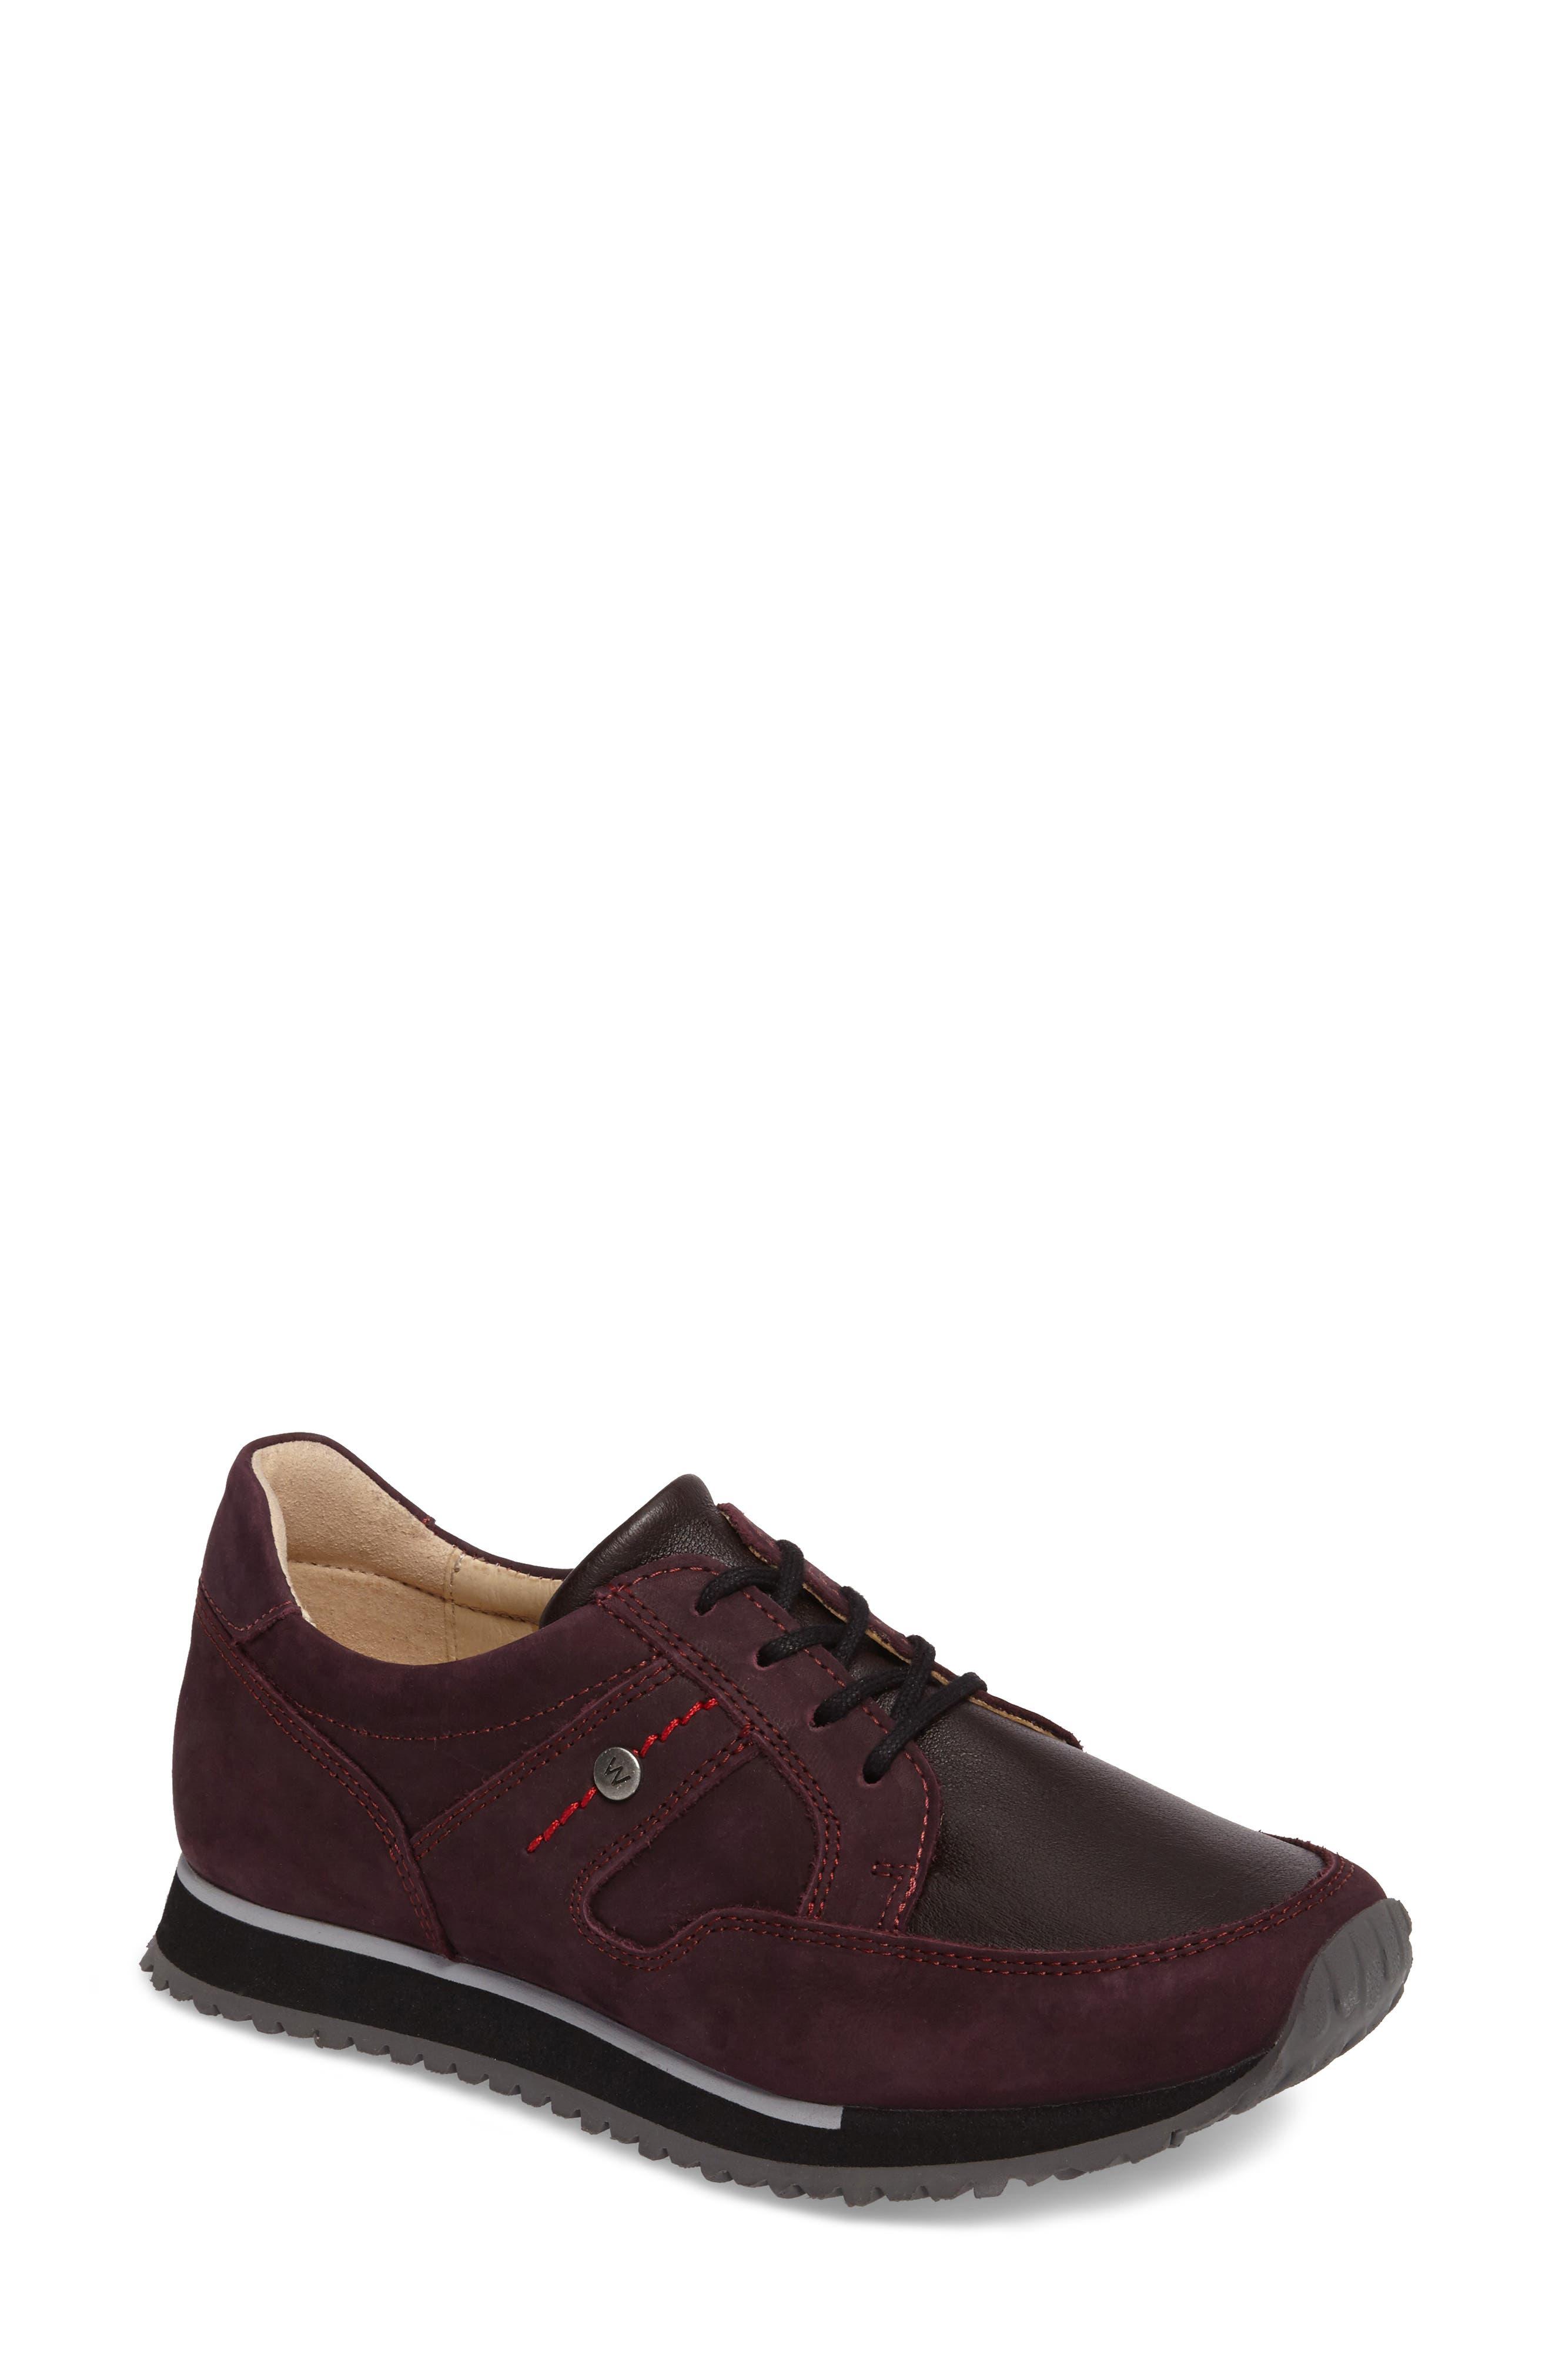 E-Walk Sneaker,                             Main thumbnail 1, color,                             BORDO LEATHER